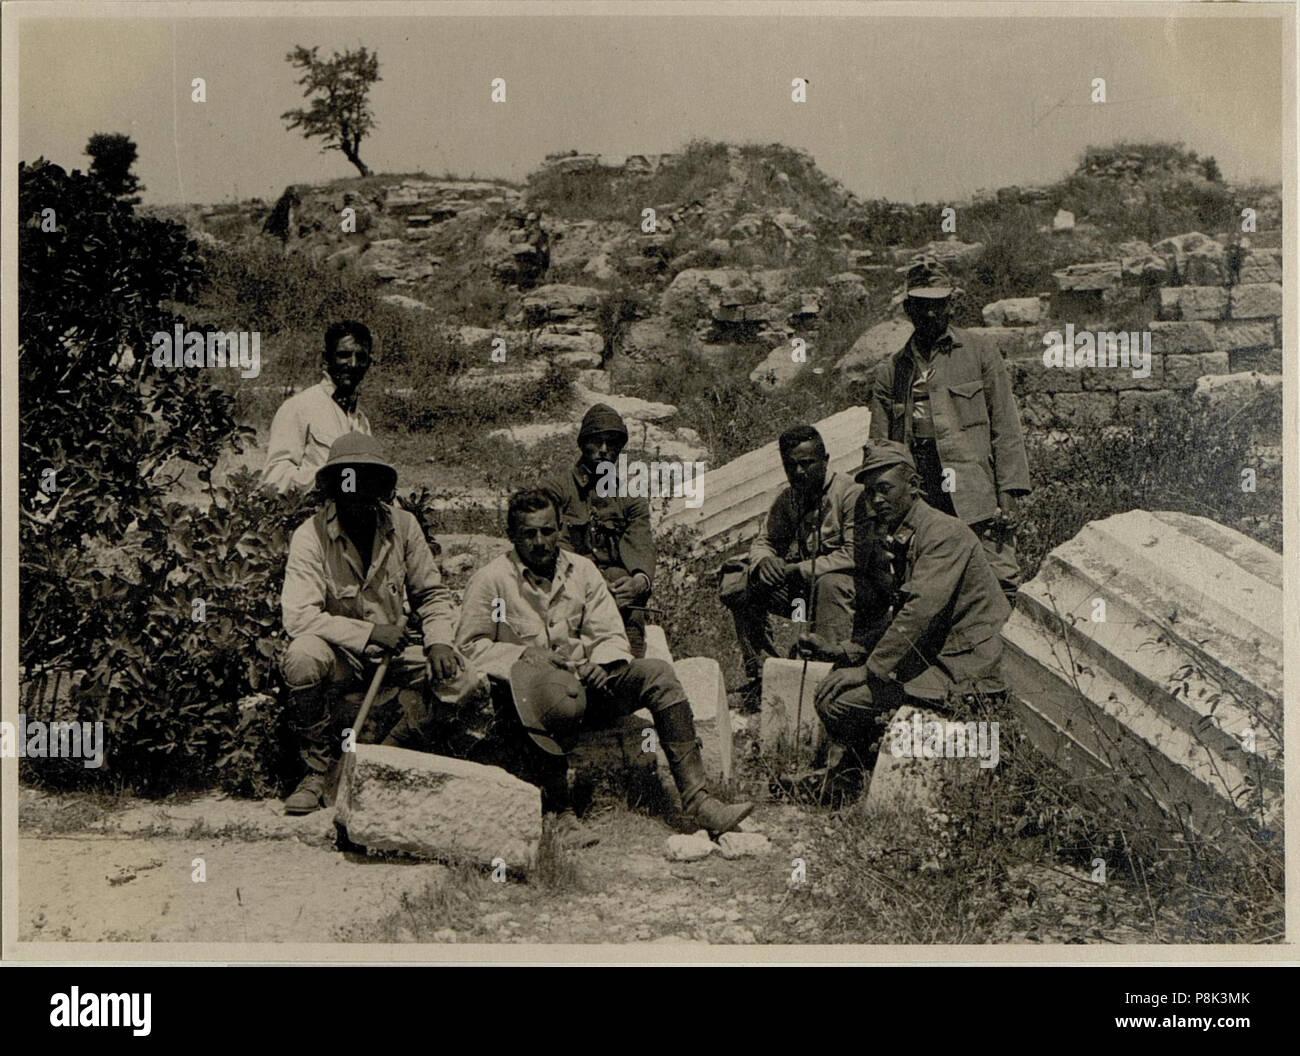 1918 Stock Photos Images Page 445 Alamy Mk 6367 562 Troja Batteriemannschaft Im Rmtheater Bildid 15546367 Image